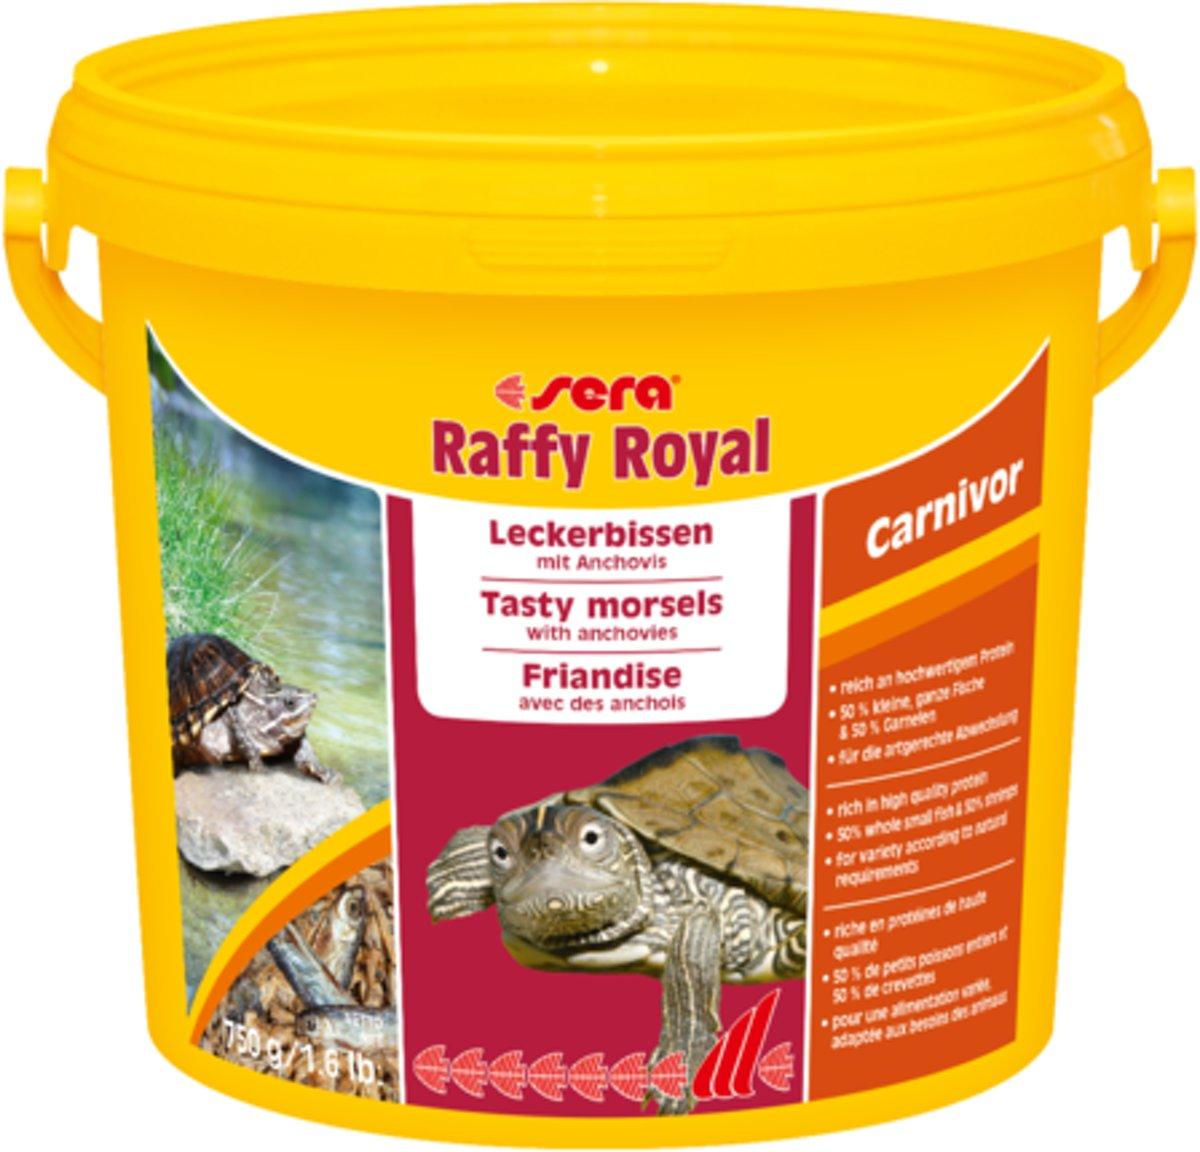 Sera Raffy royal - 3800ml - Reptielenvoer gedroogde visjes schildpadvoer